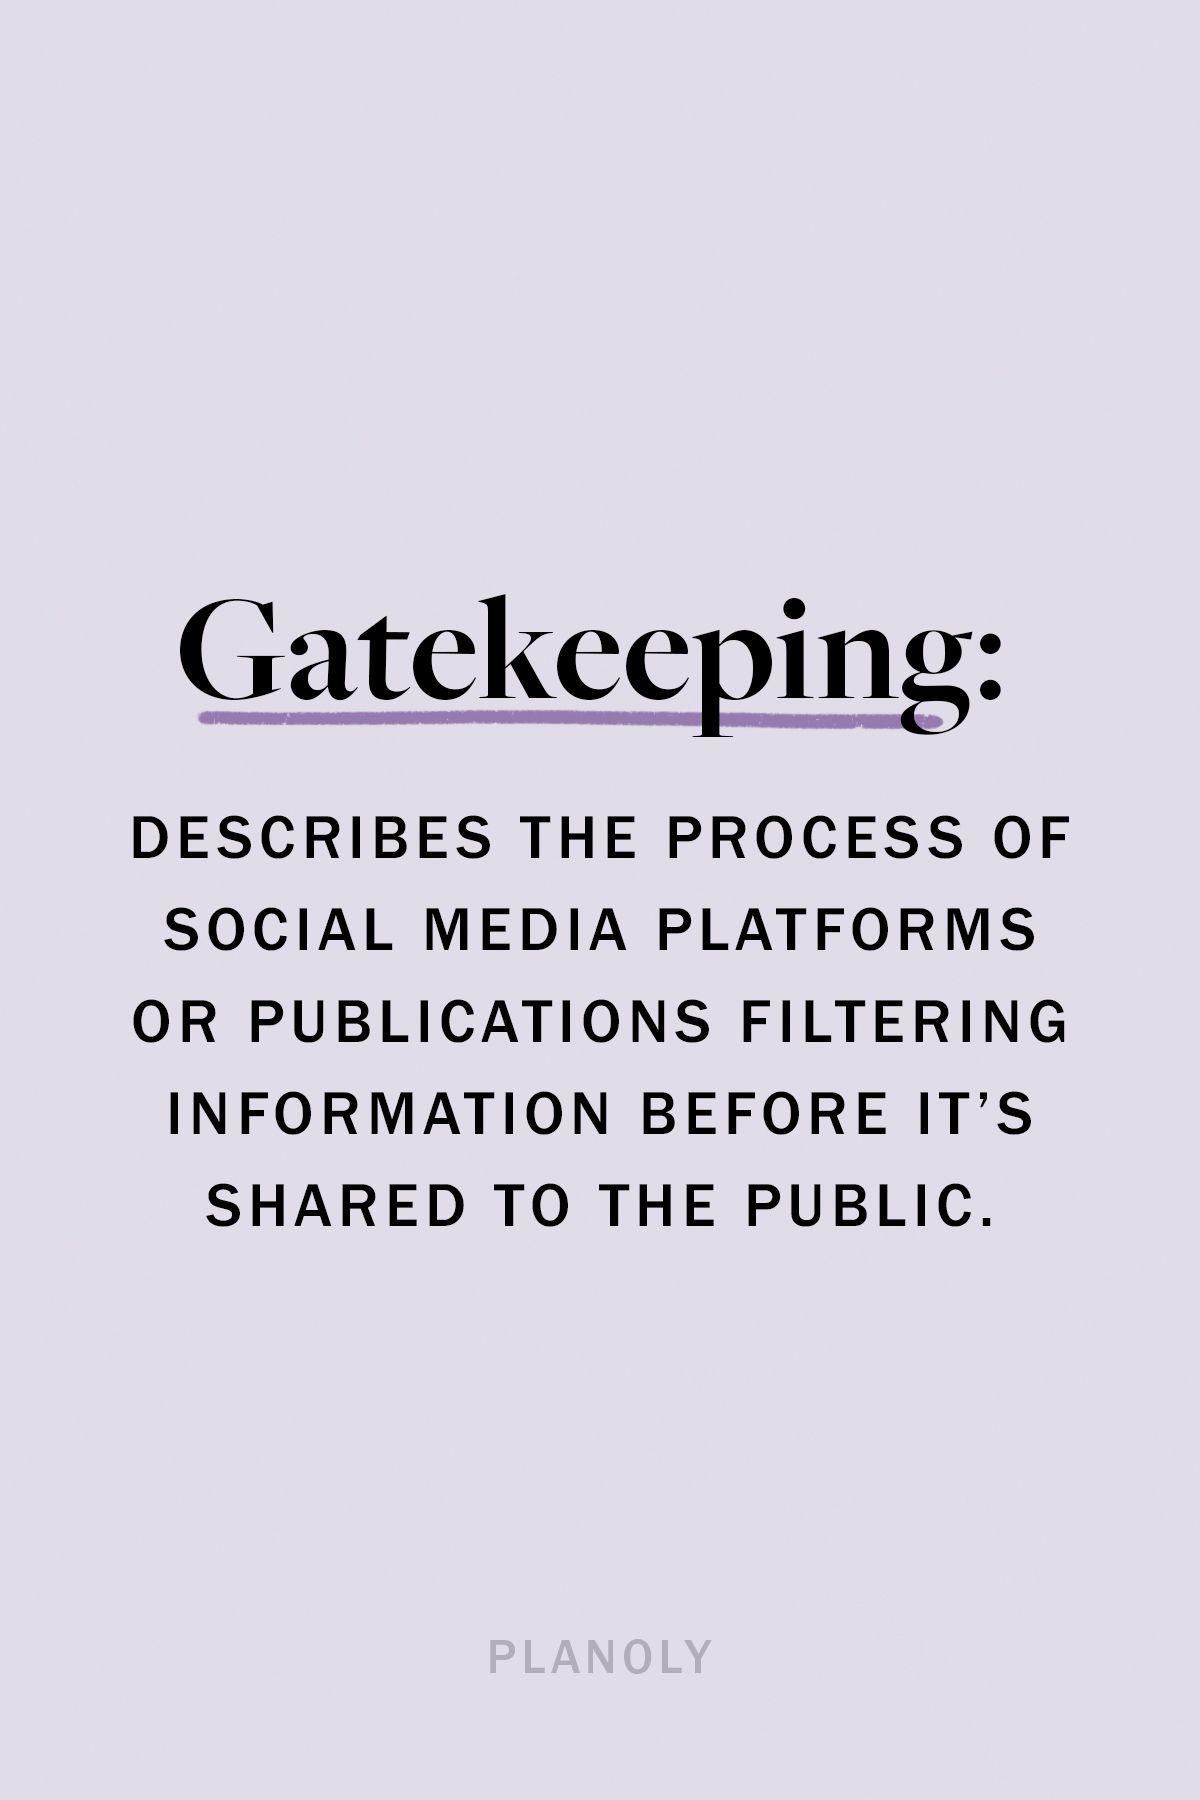 PLANOLY - Blog - Gatekeeping and Censorship in Social Media - Image 1